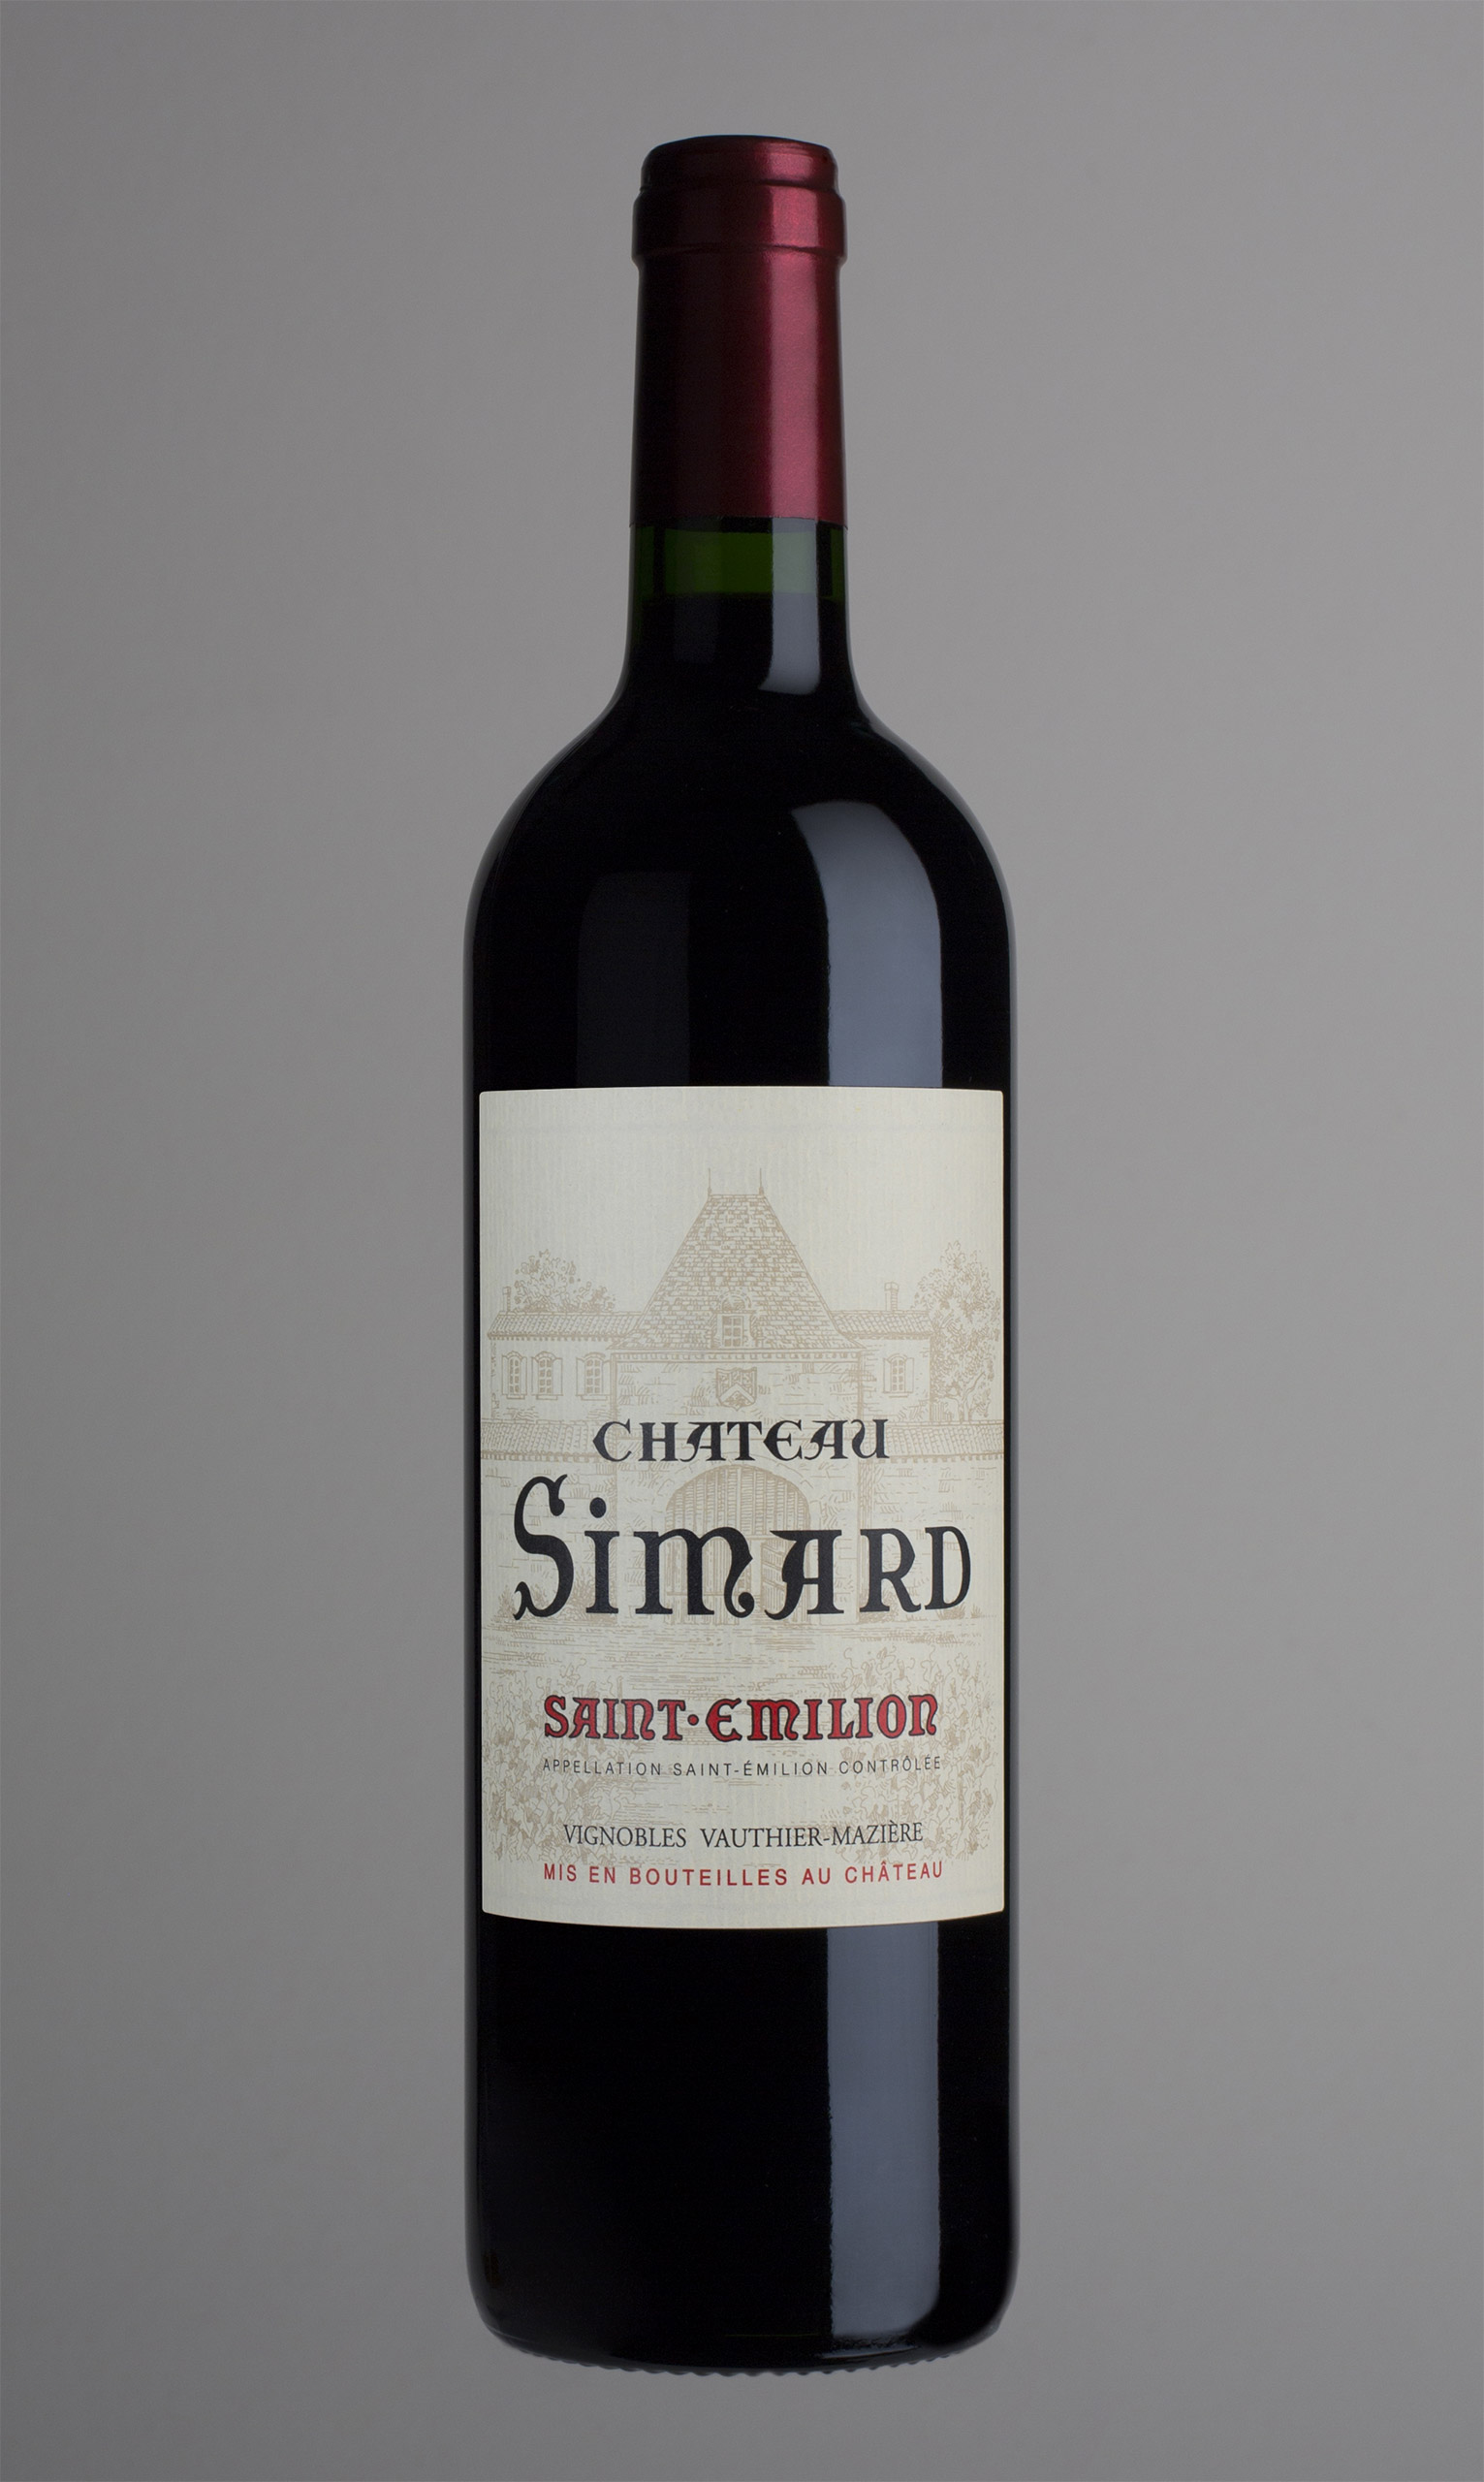 23_CHATEAU-SIMARD_2007